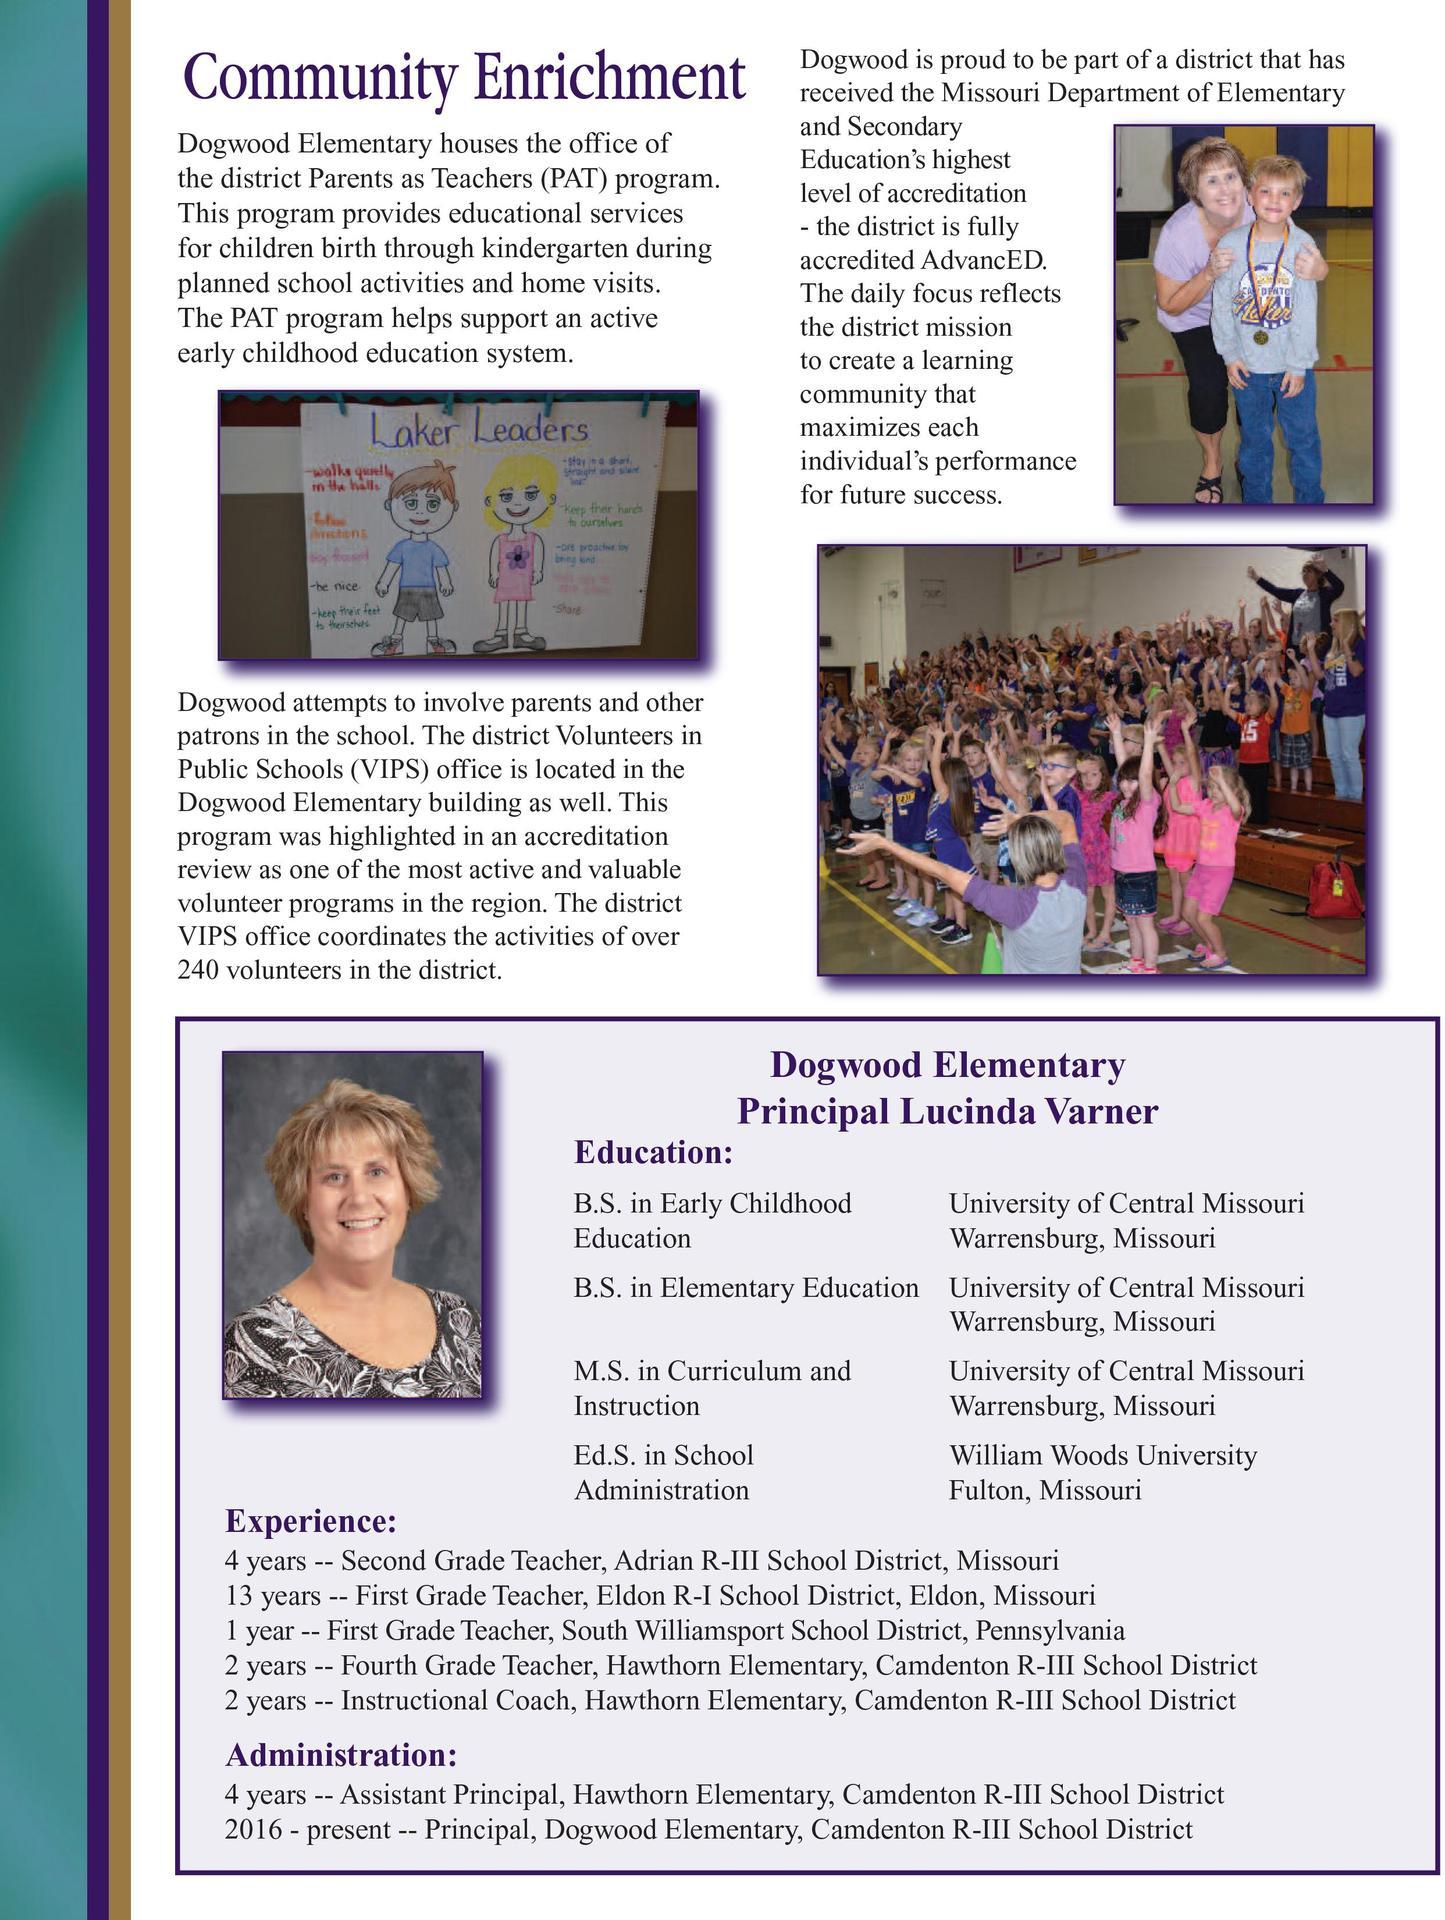 Dogwood Elementary Profile page 3